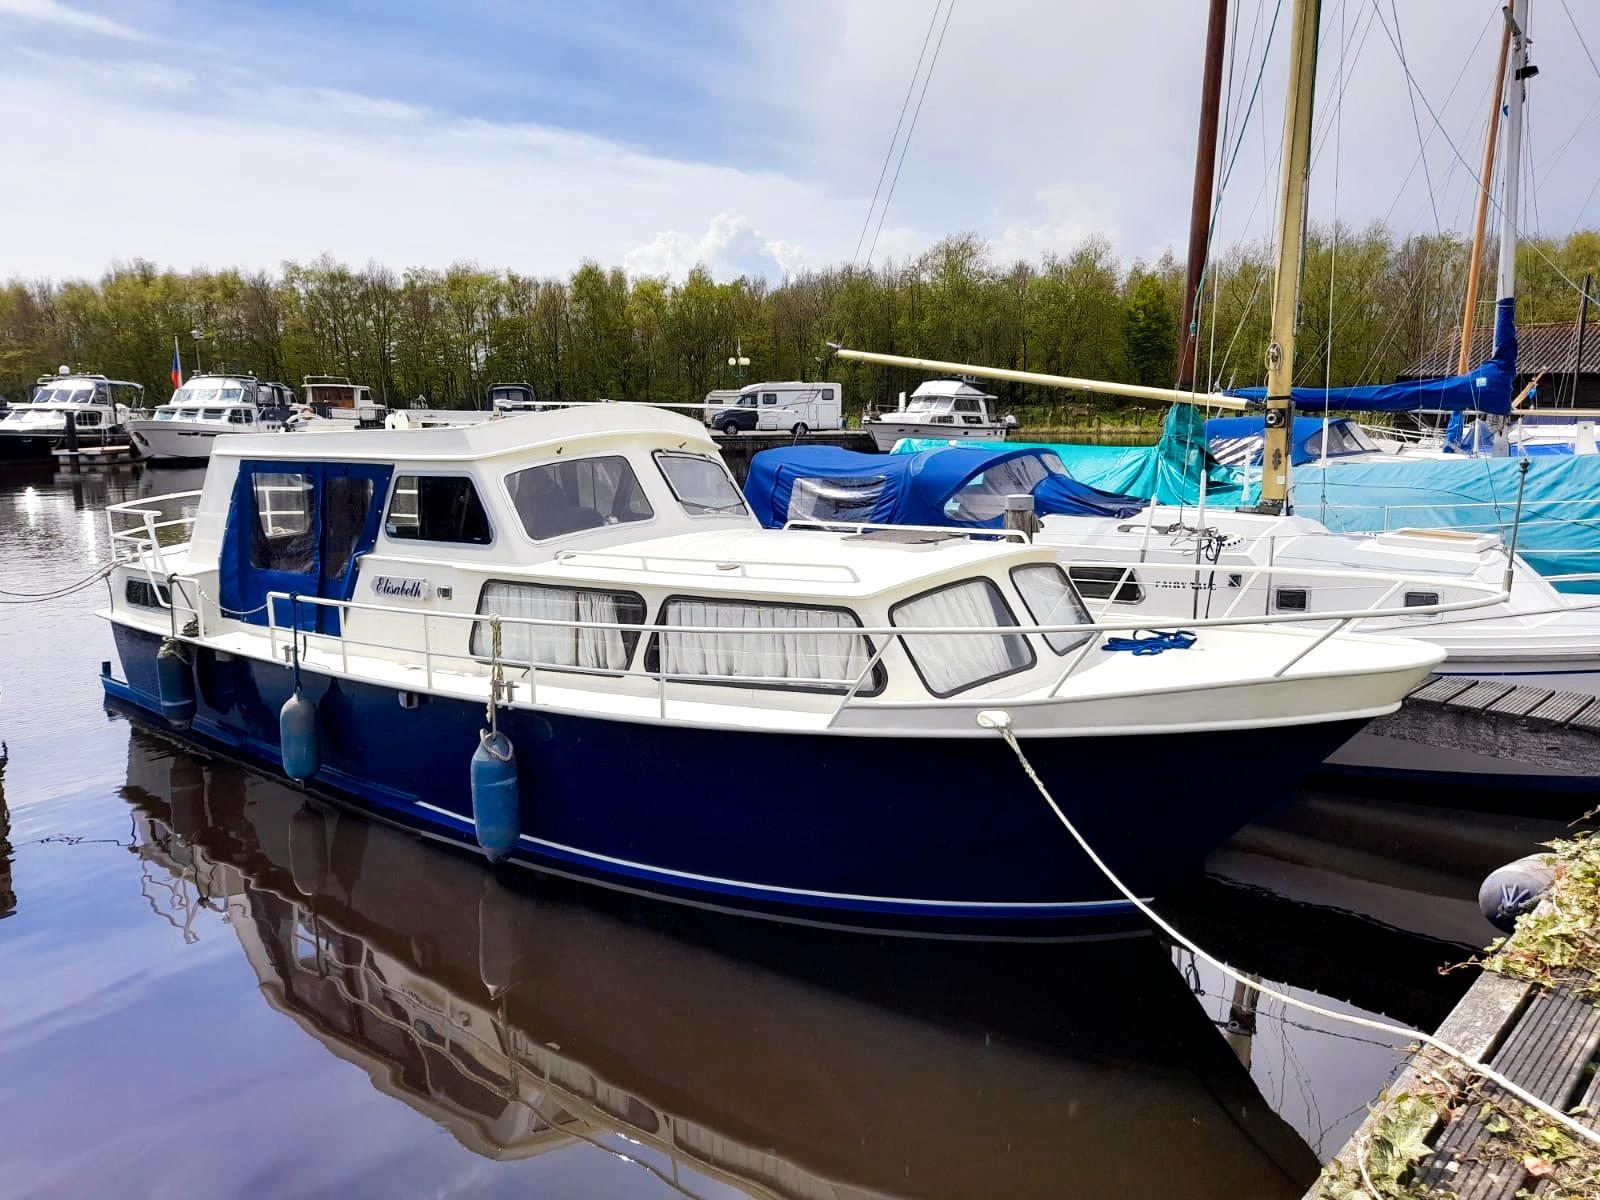 Jachtschilder Friesland-jacht-houten-boot-sloep-Epoxy-bootlak-jachtlak-classic-yacht-painters-Hendrik Veltman-Elizabeth